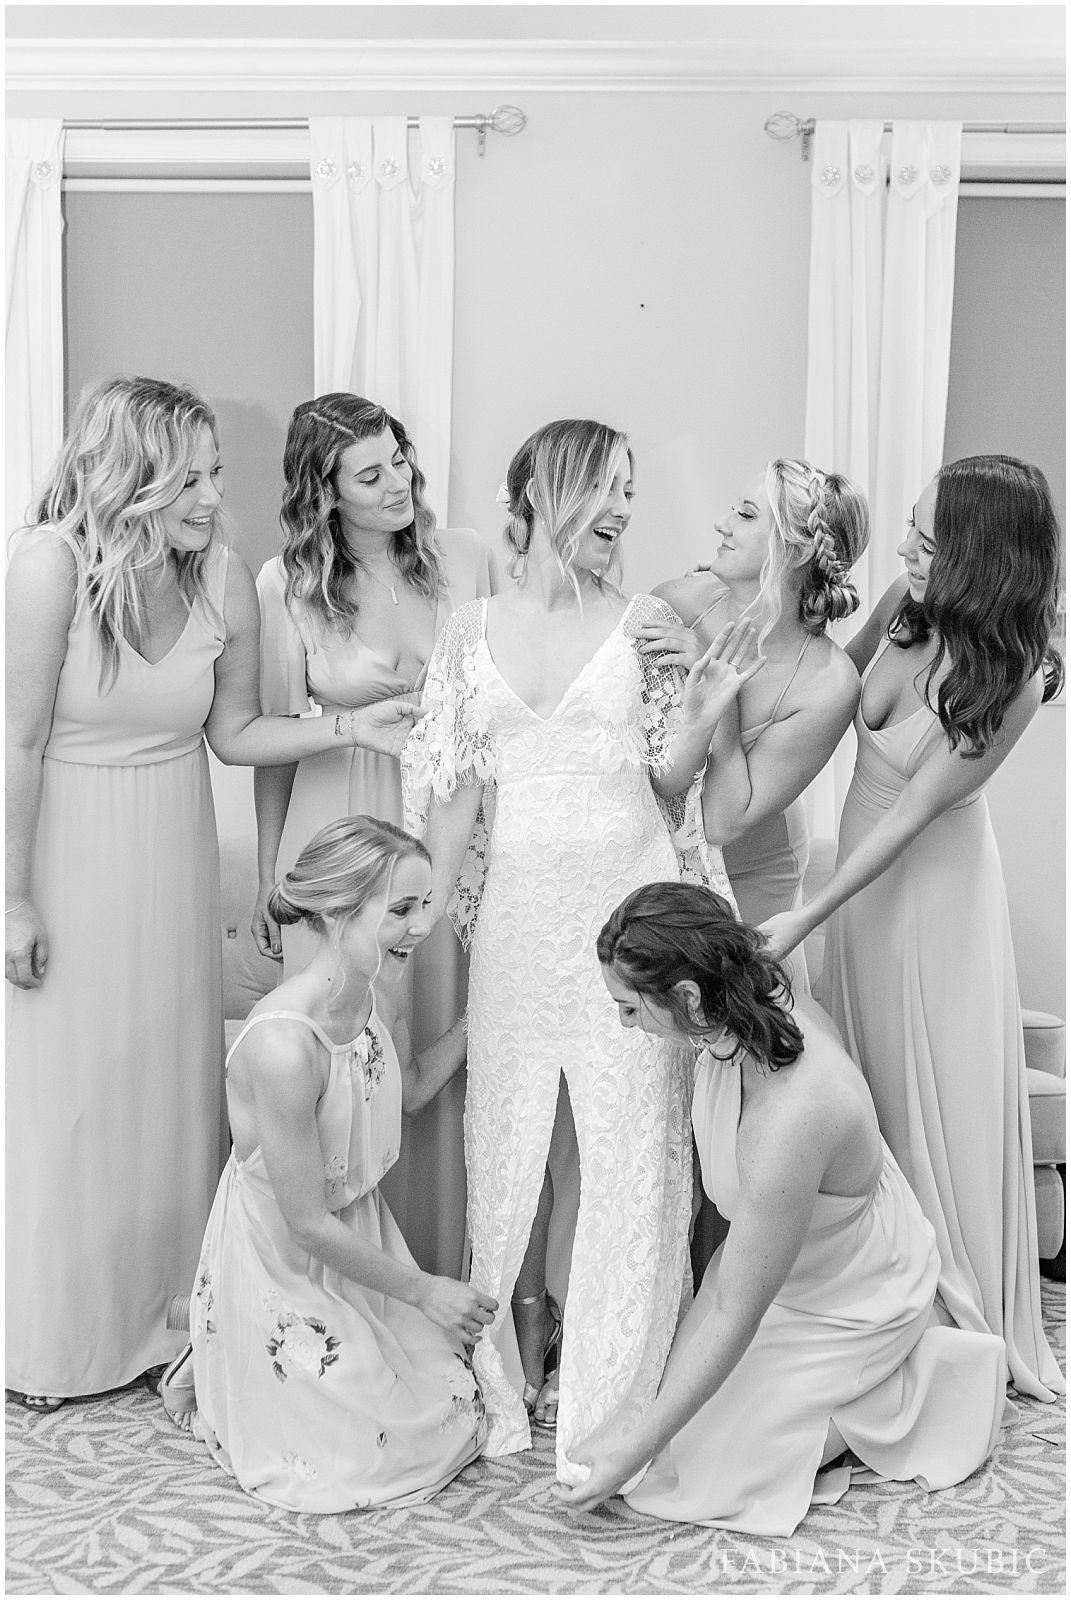 FabianaSkubic_H&M_Wedding_0011.jpg